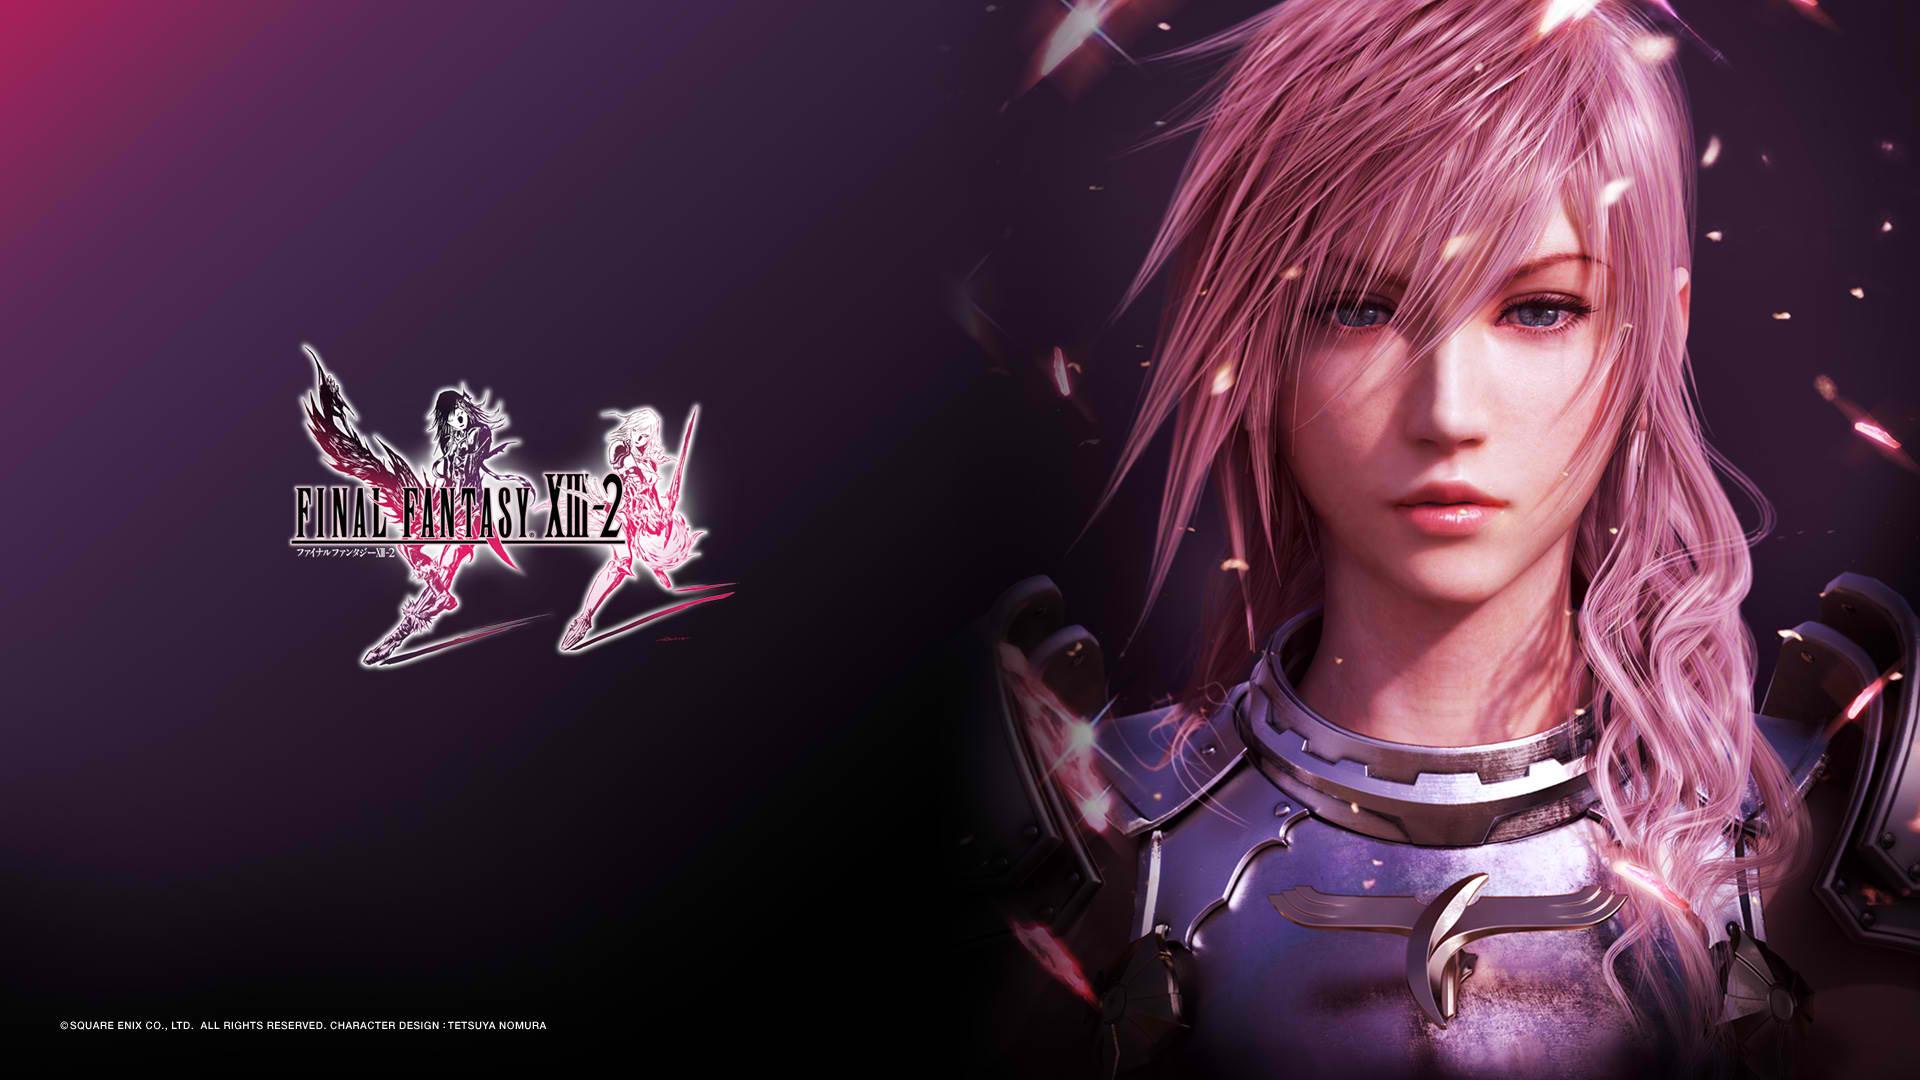 4df06a24 Final Fantasy XIII 2 Lightning Wallpaper 1920 x 1080jpg 1920x1080